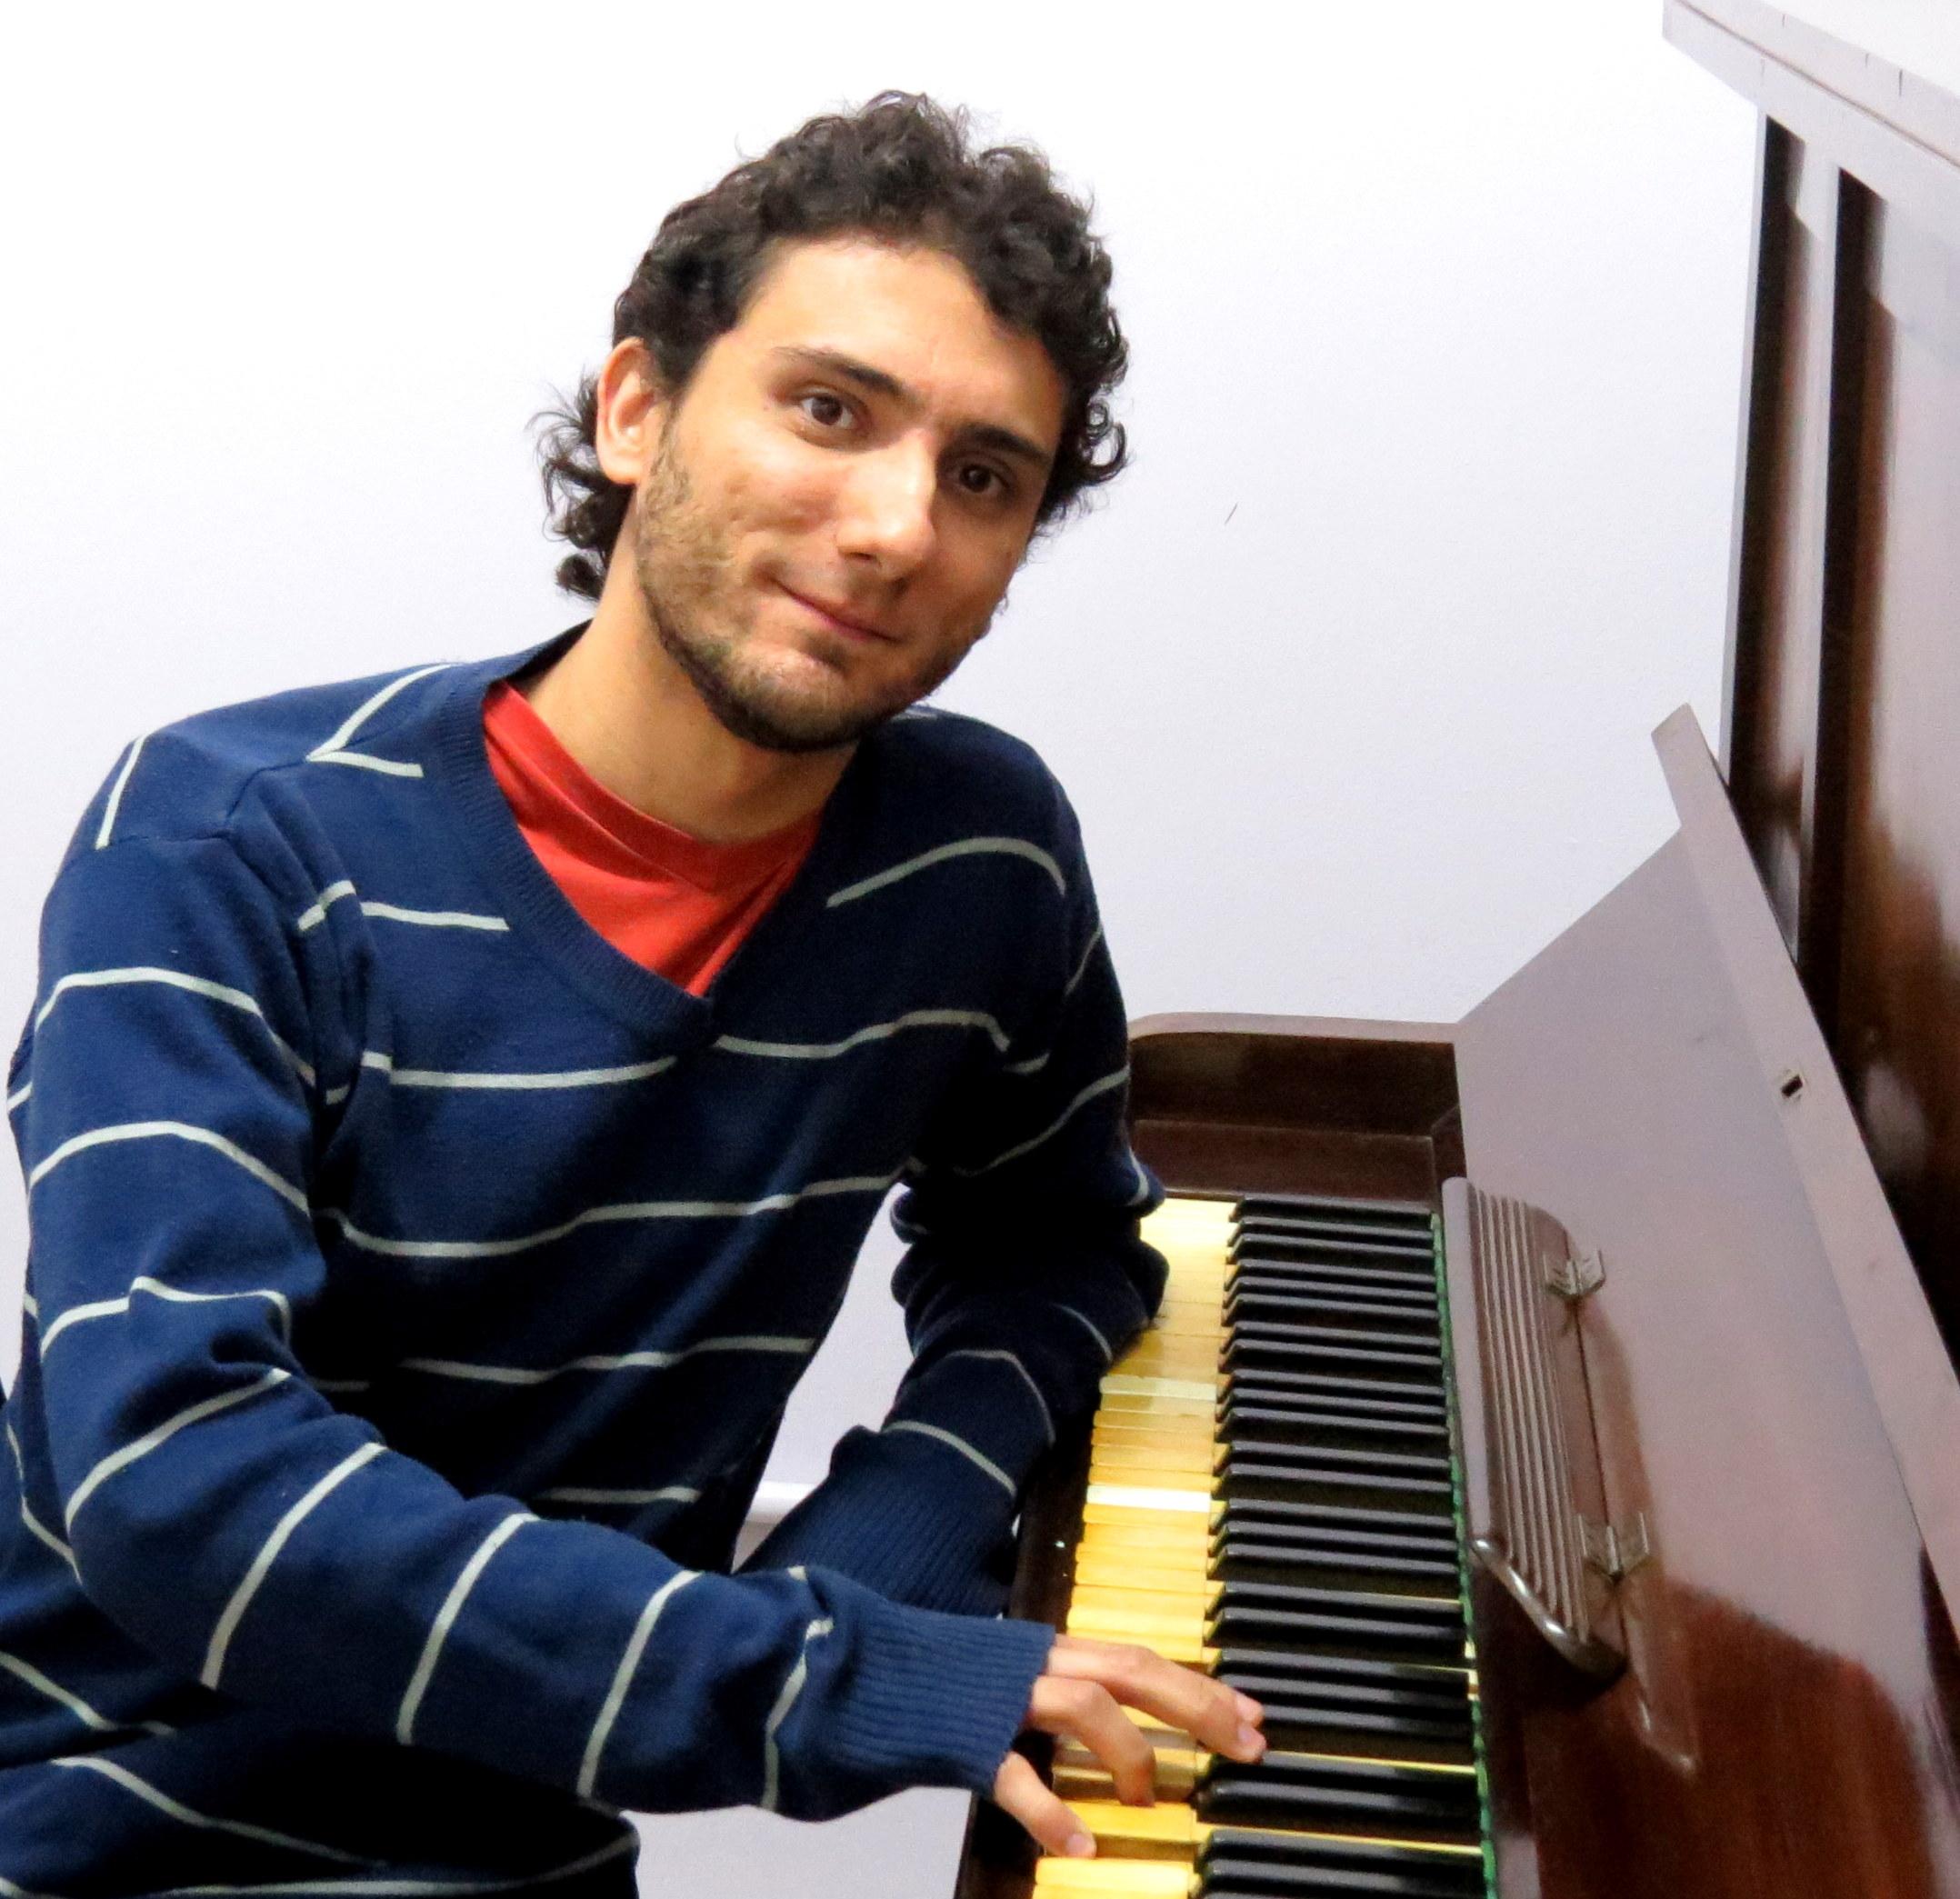 Carlos Alexandre Noguêz da Silva